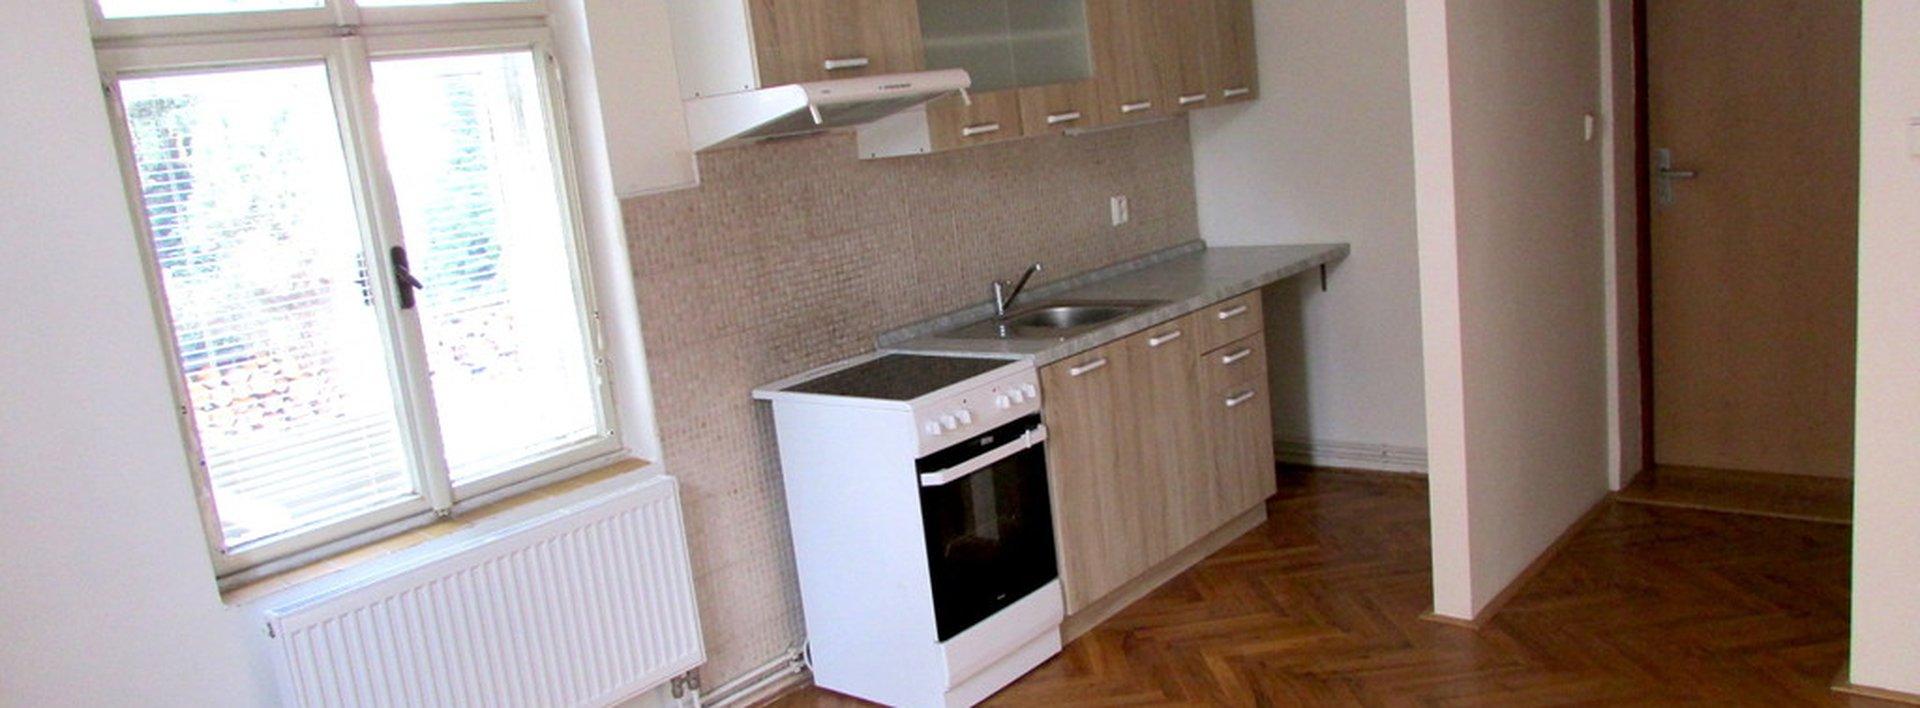 Pronájem bytu 2+kk, 36 m² - Liberec, Staré Pavlovice, Ev.č.: N47447